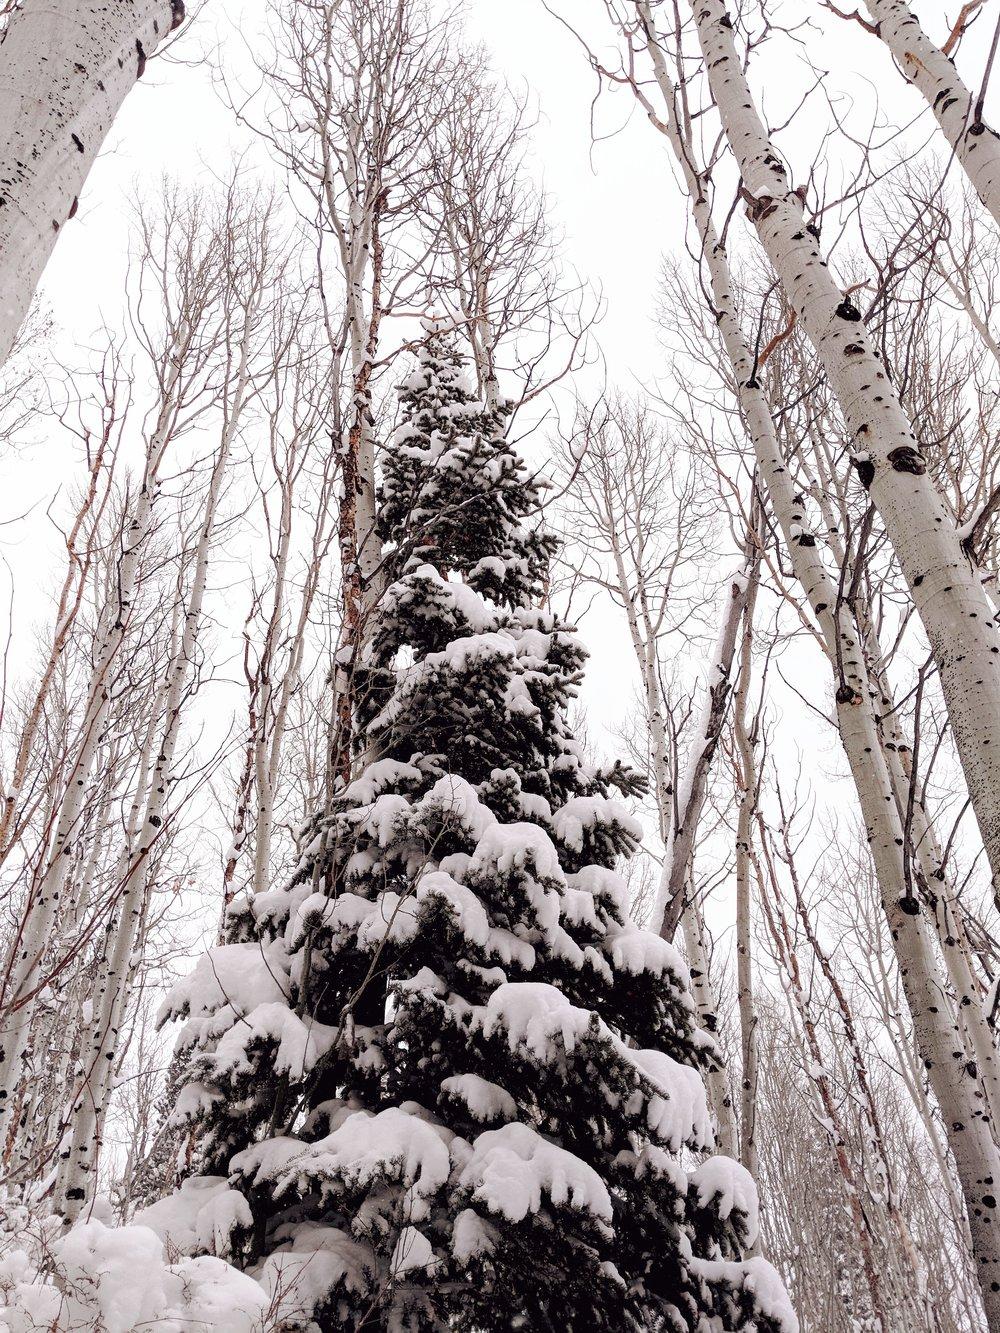 Amongst the Birch trees a giant pine tree   taken on Google Pixel 3  Park City, Utah #TeamPixel